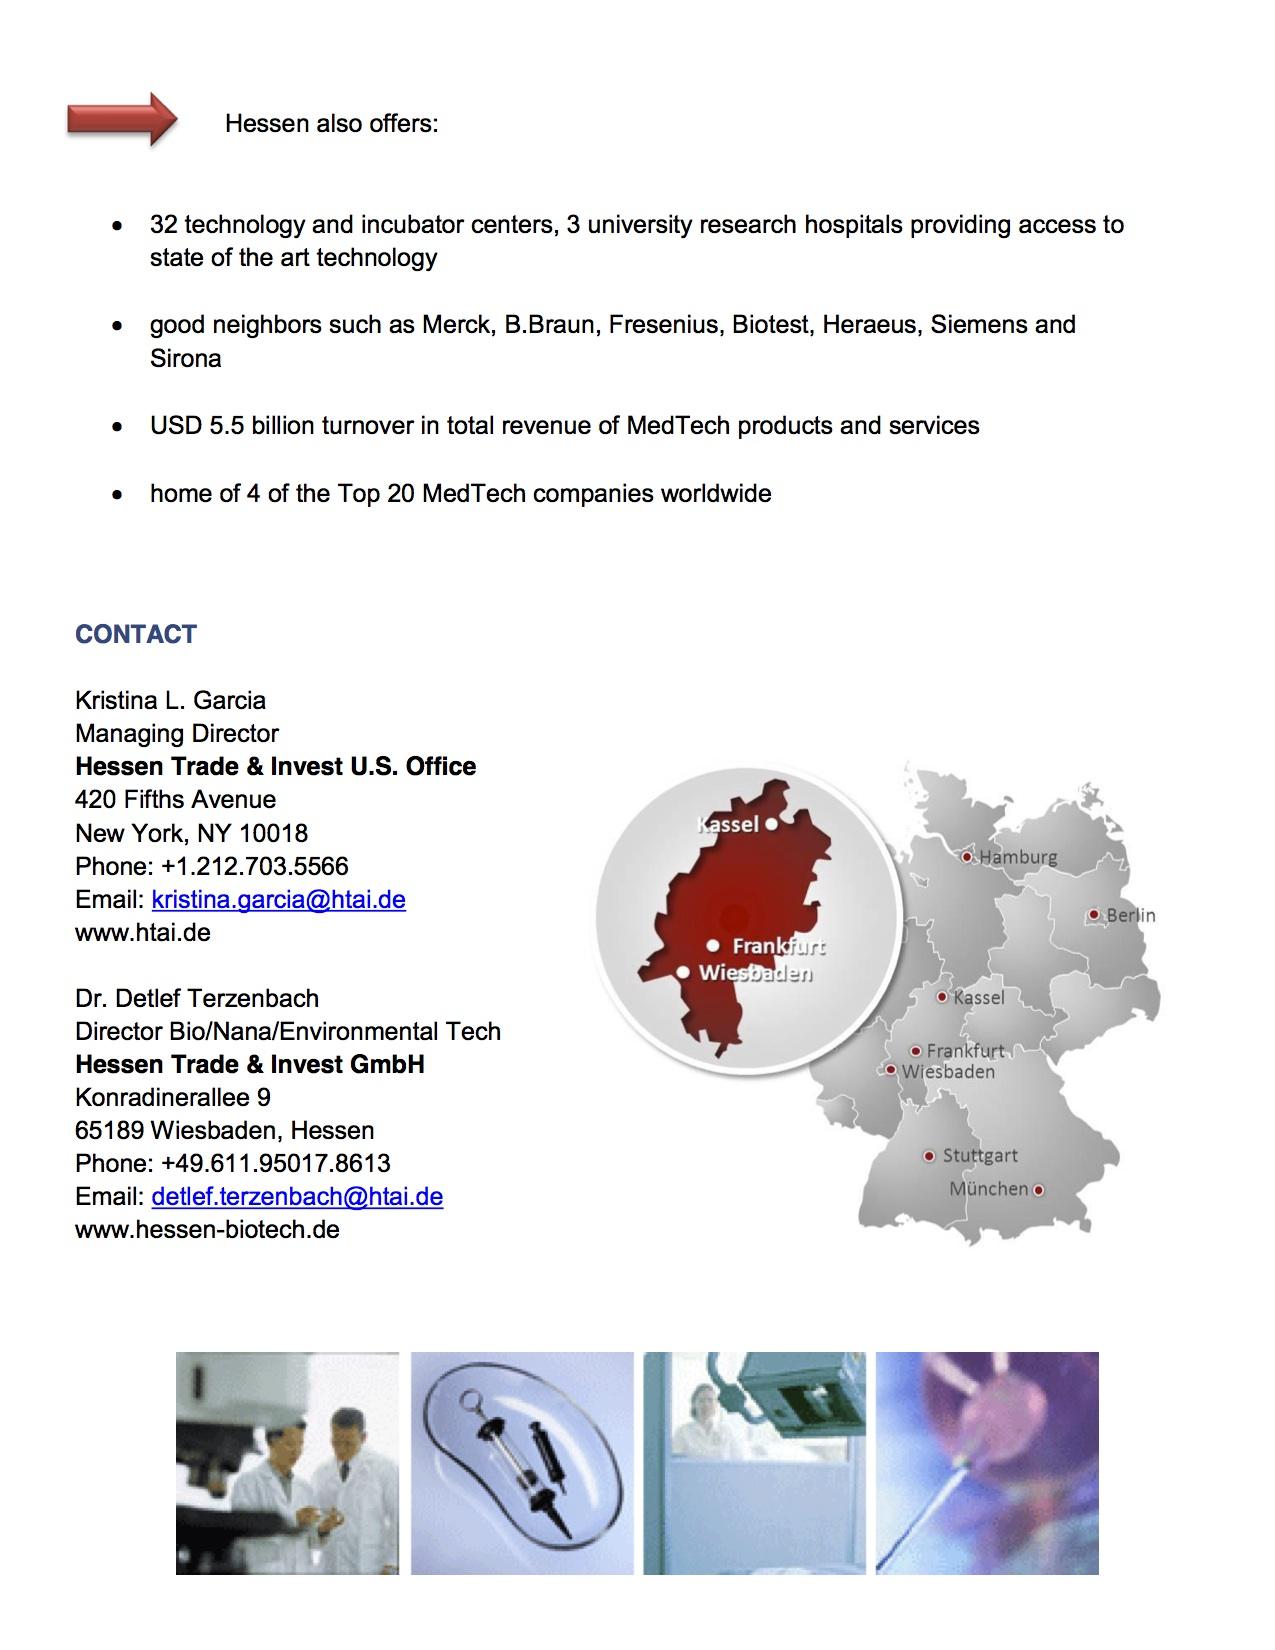 Hessen Profile_MedTech_2015 2